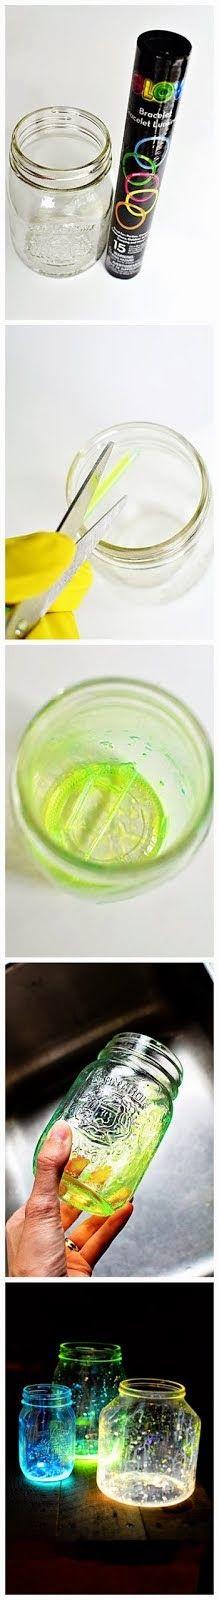 How to make a glow jars